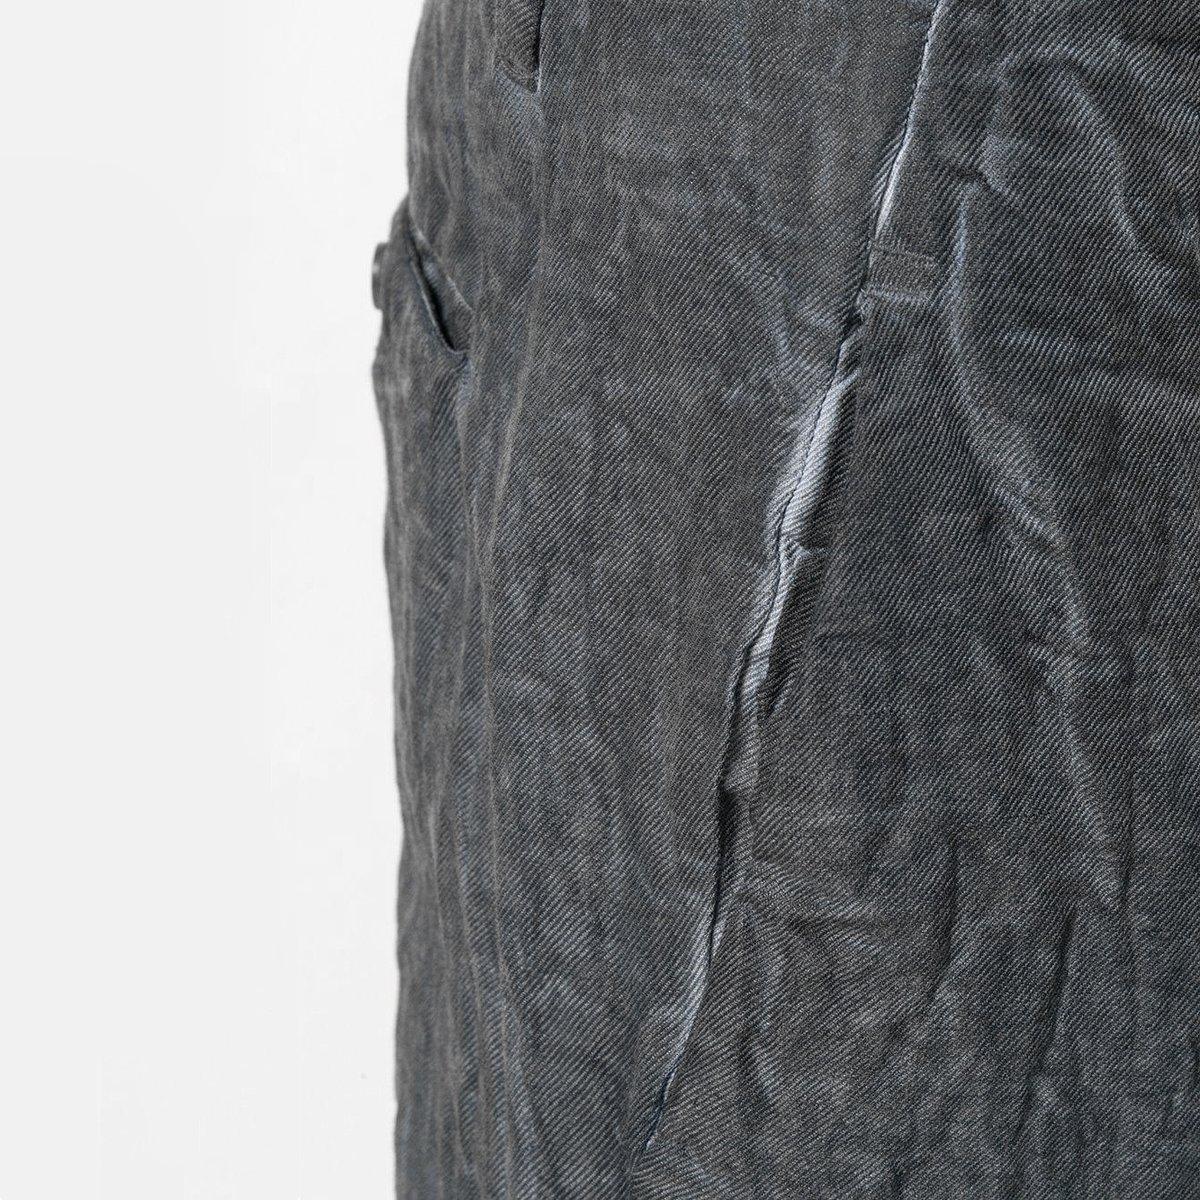 transit-Wrinkled-Trousers-detail.jpg